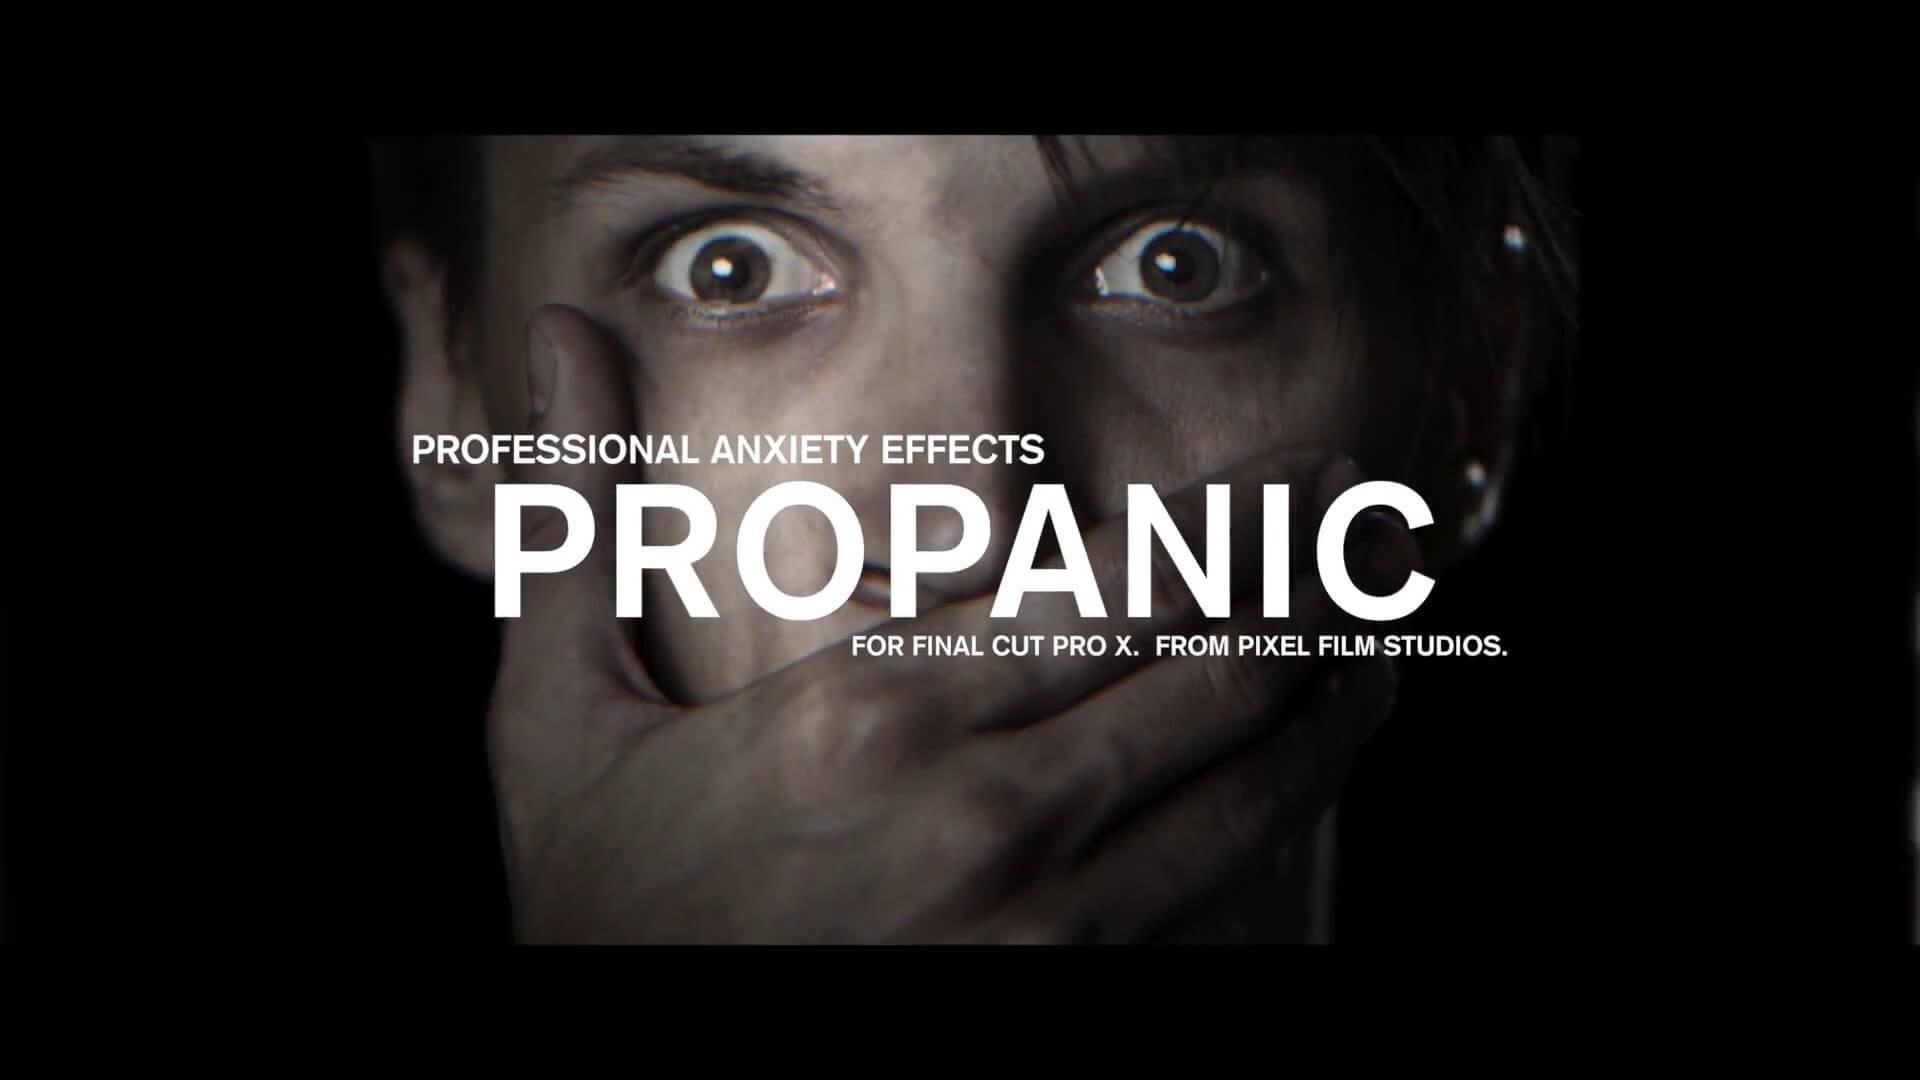 FCPX影片抖动扭曲效果插件 ProPanic 渲染紧张恐慌气氛